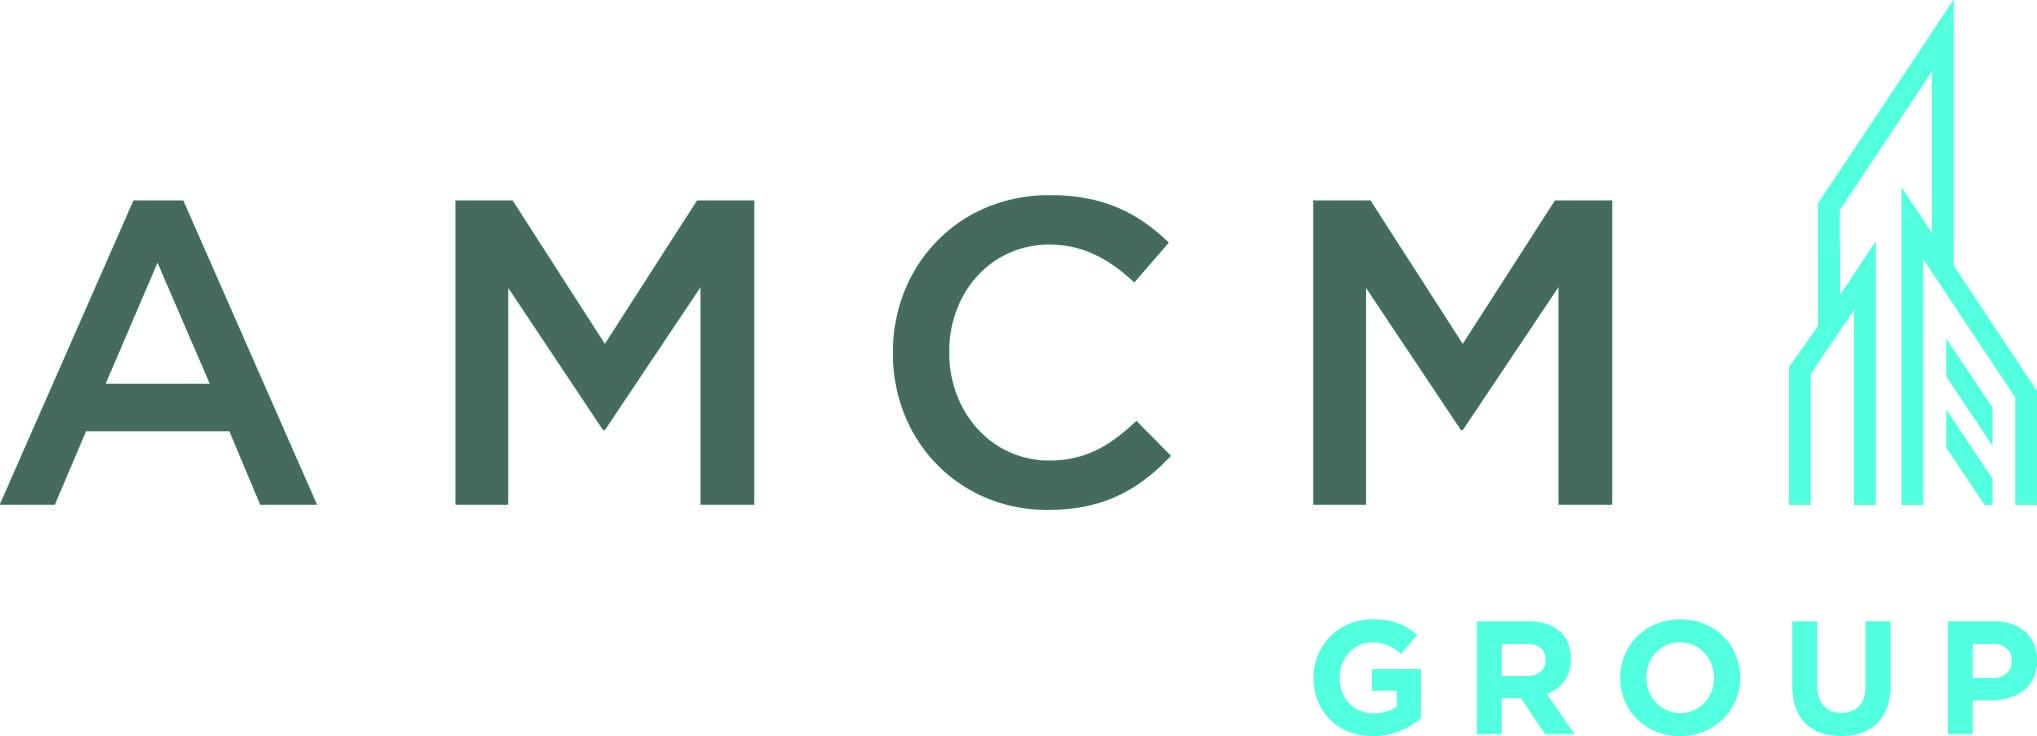 AMCM Final Logo.jpg